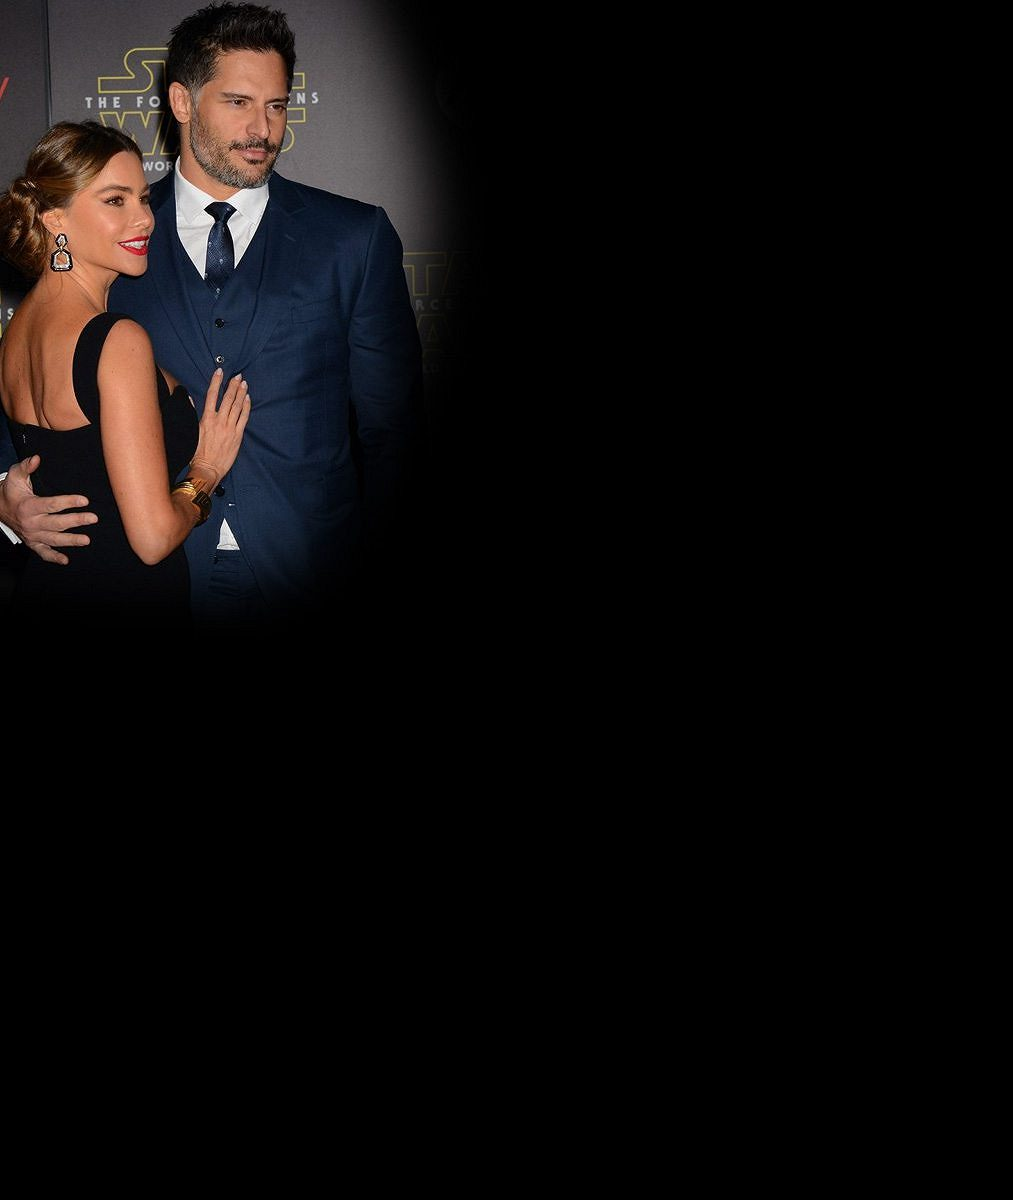 Novomanželé Vergara a Manganiello byli ozdobou premiéry nejočekávanějšího filmu letošního roku